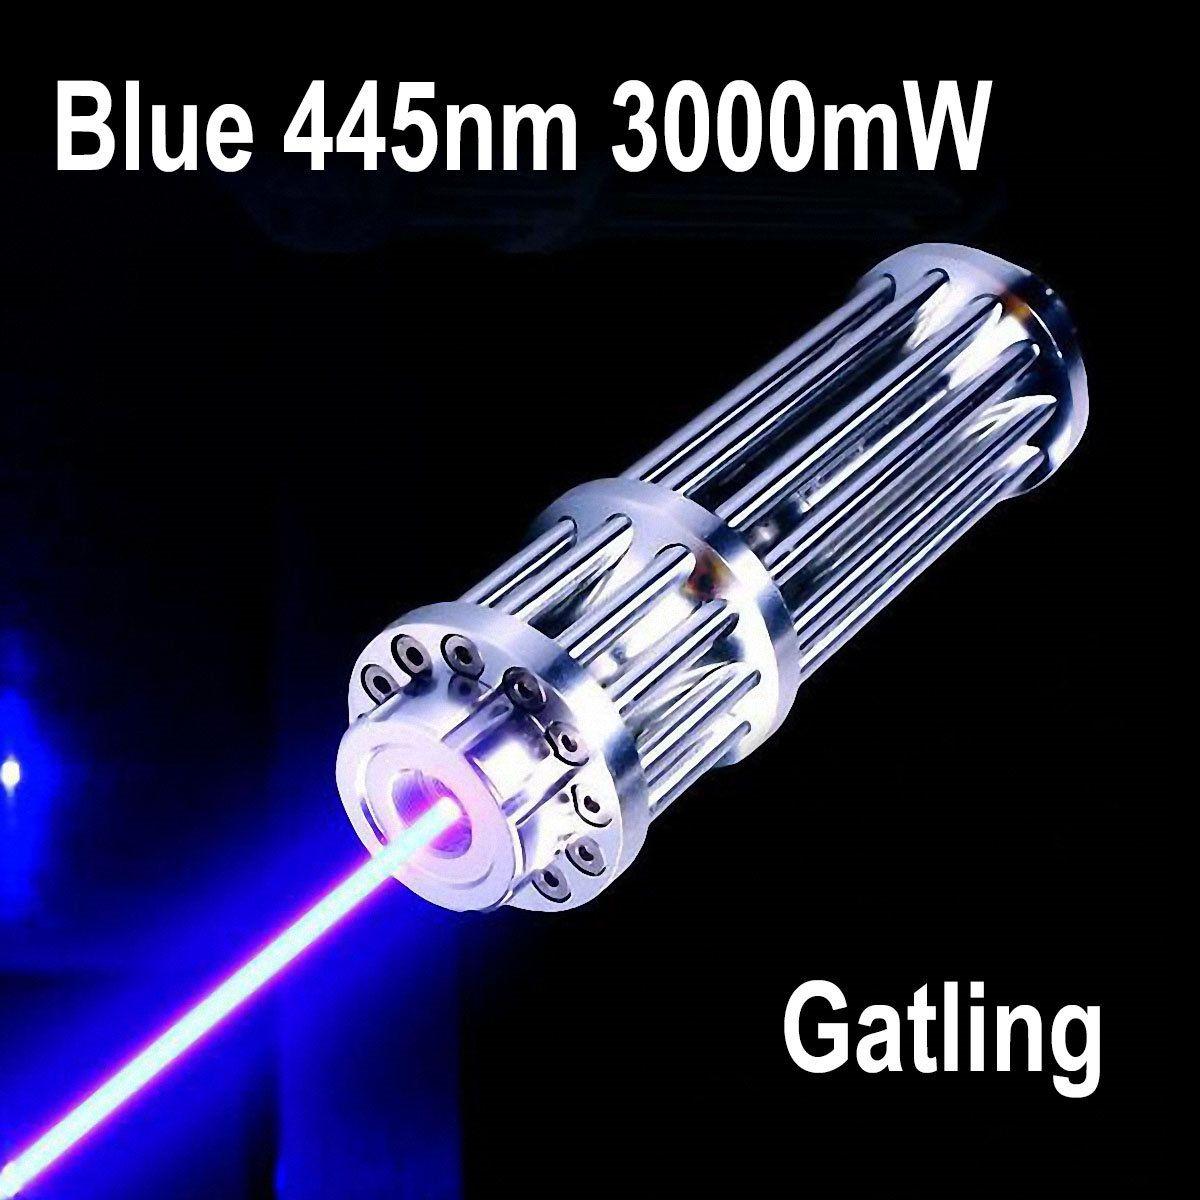 Burning Lasers 1w 2w 3w 5w 10w Laser Pointers Best Circuit Gatling 3000mw Class 4 High Power Pointer Blue 445nm